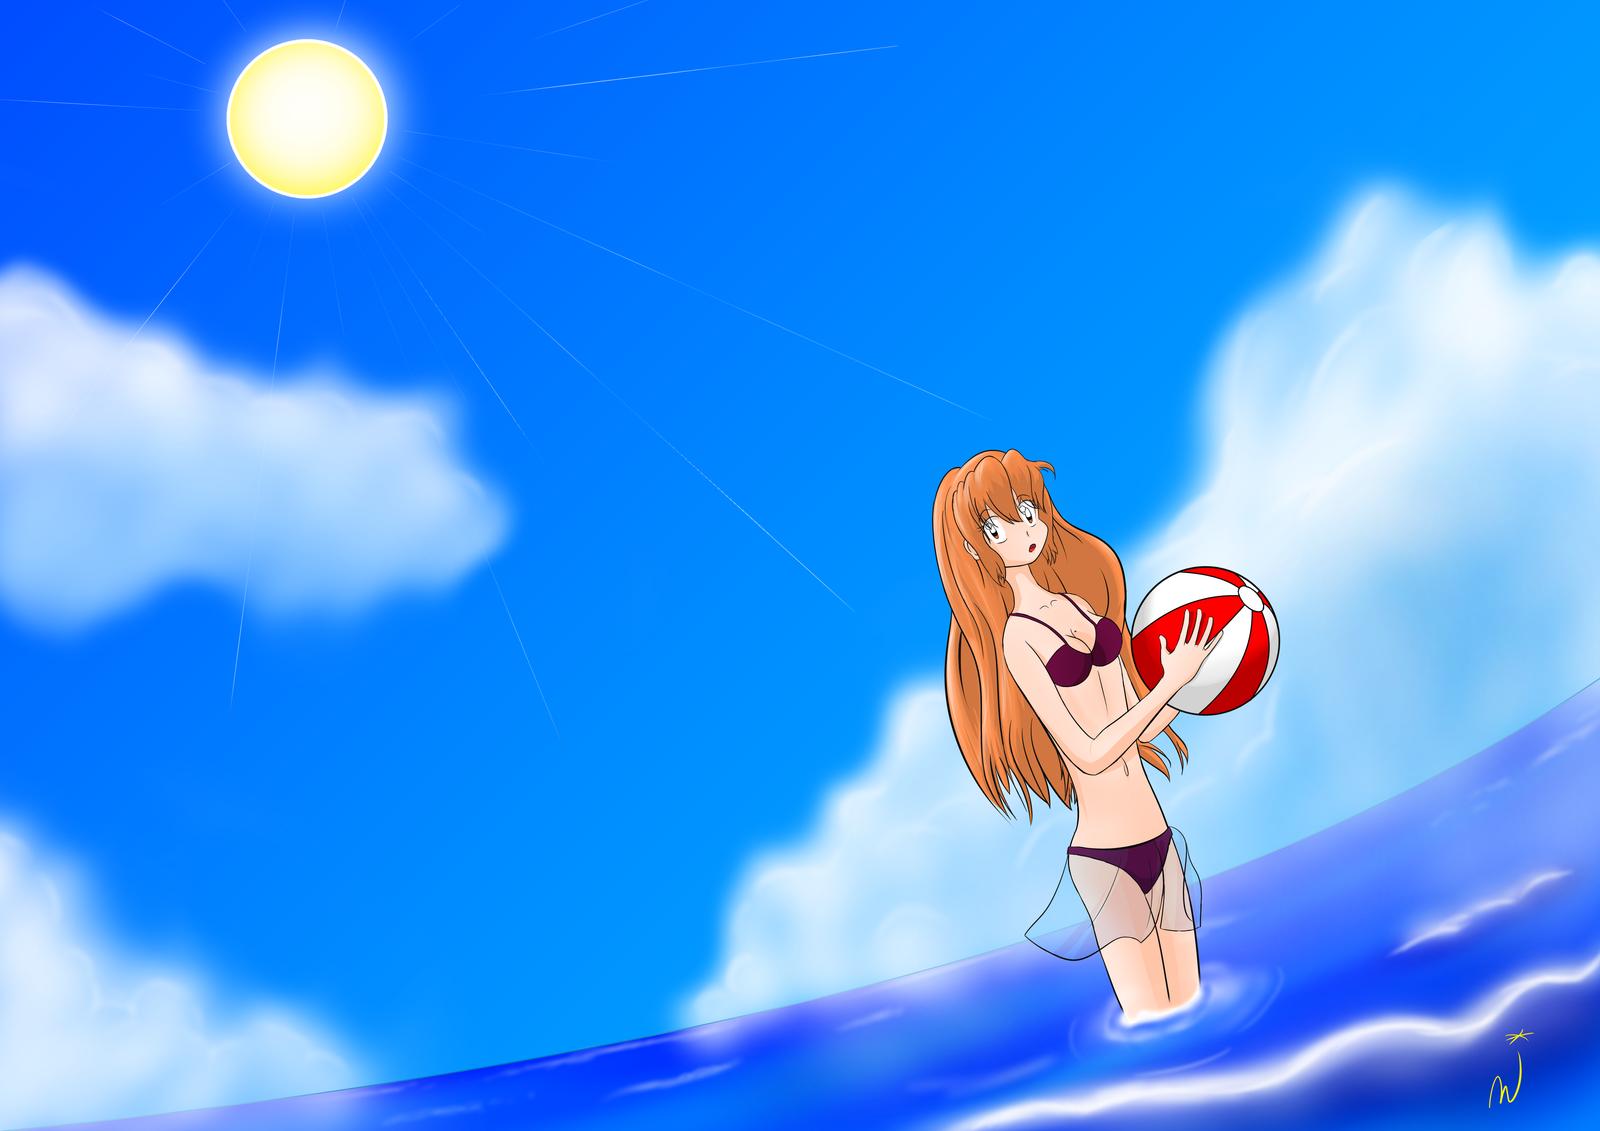 Mikuru On the Beach by Dumdodoor